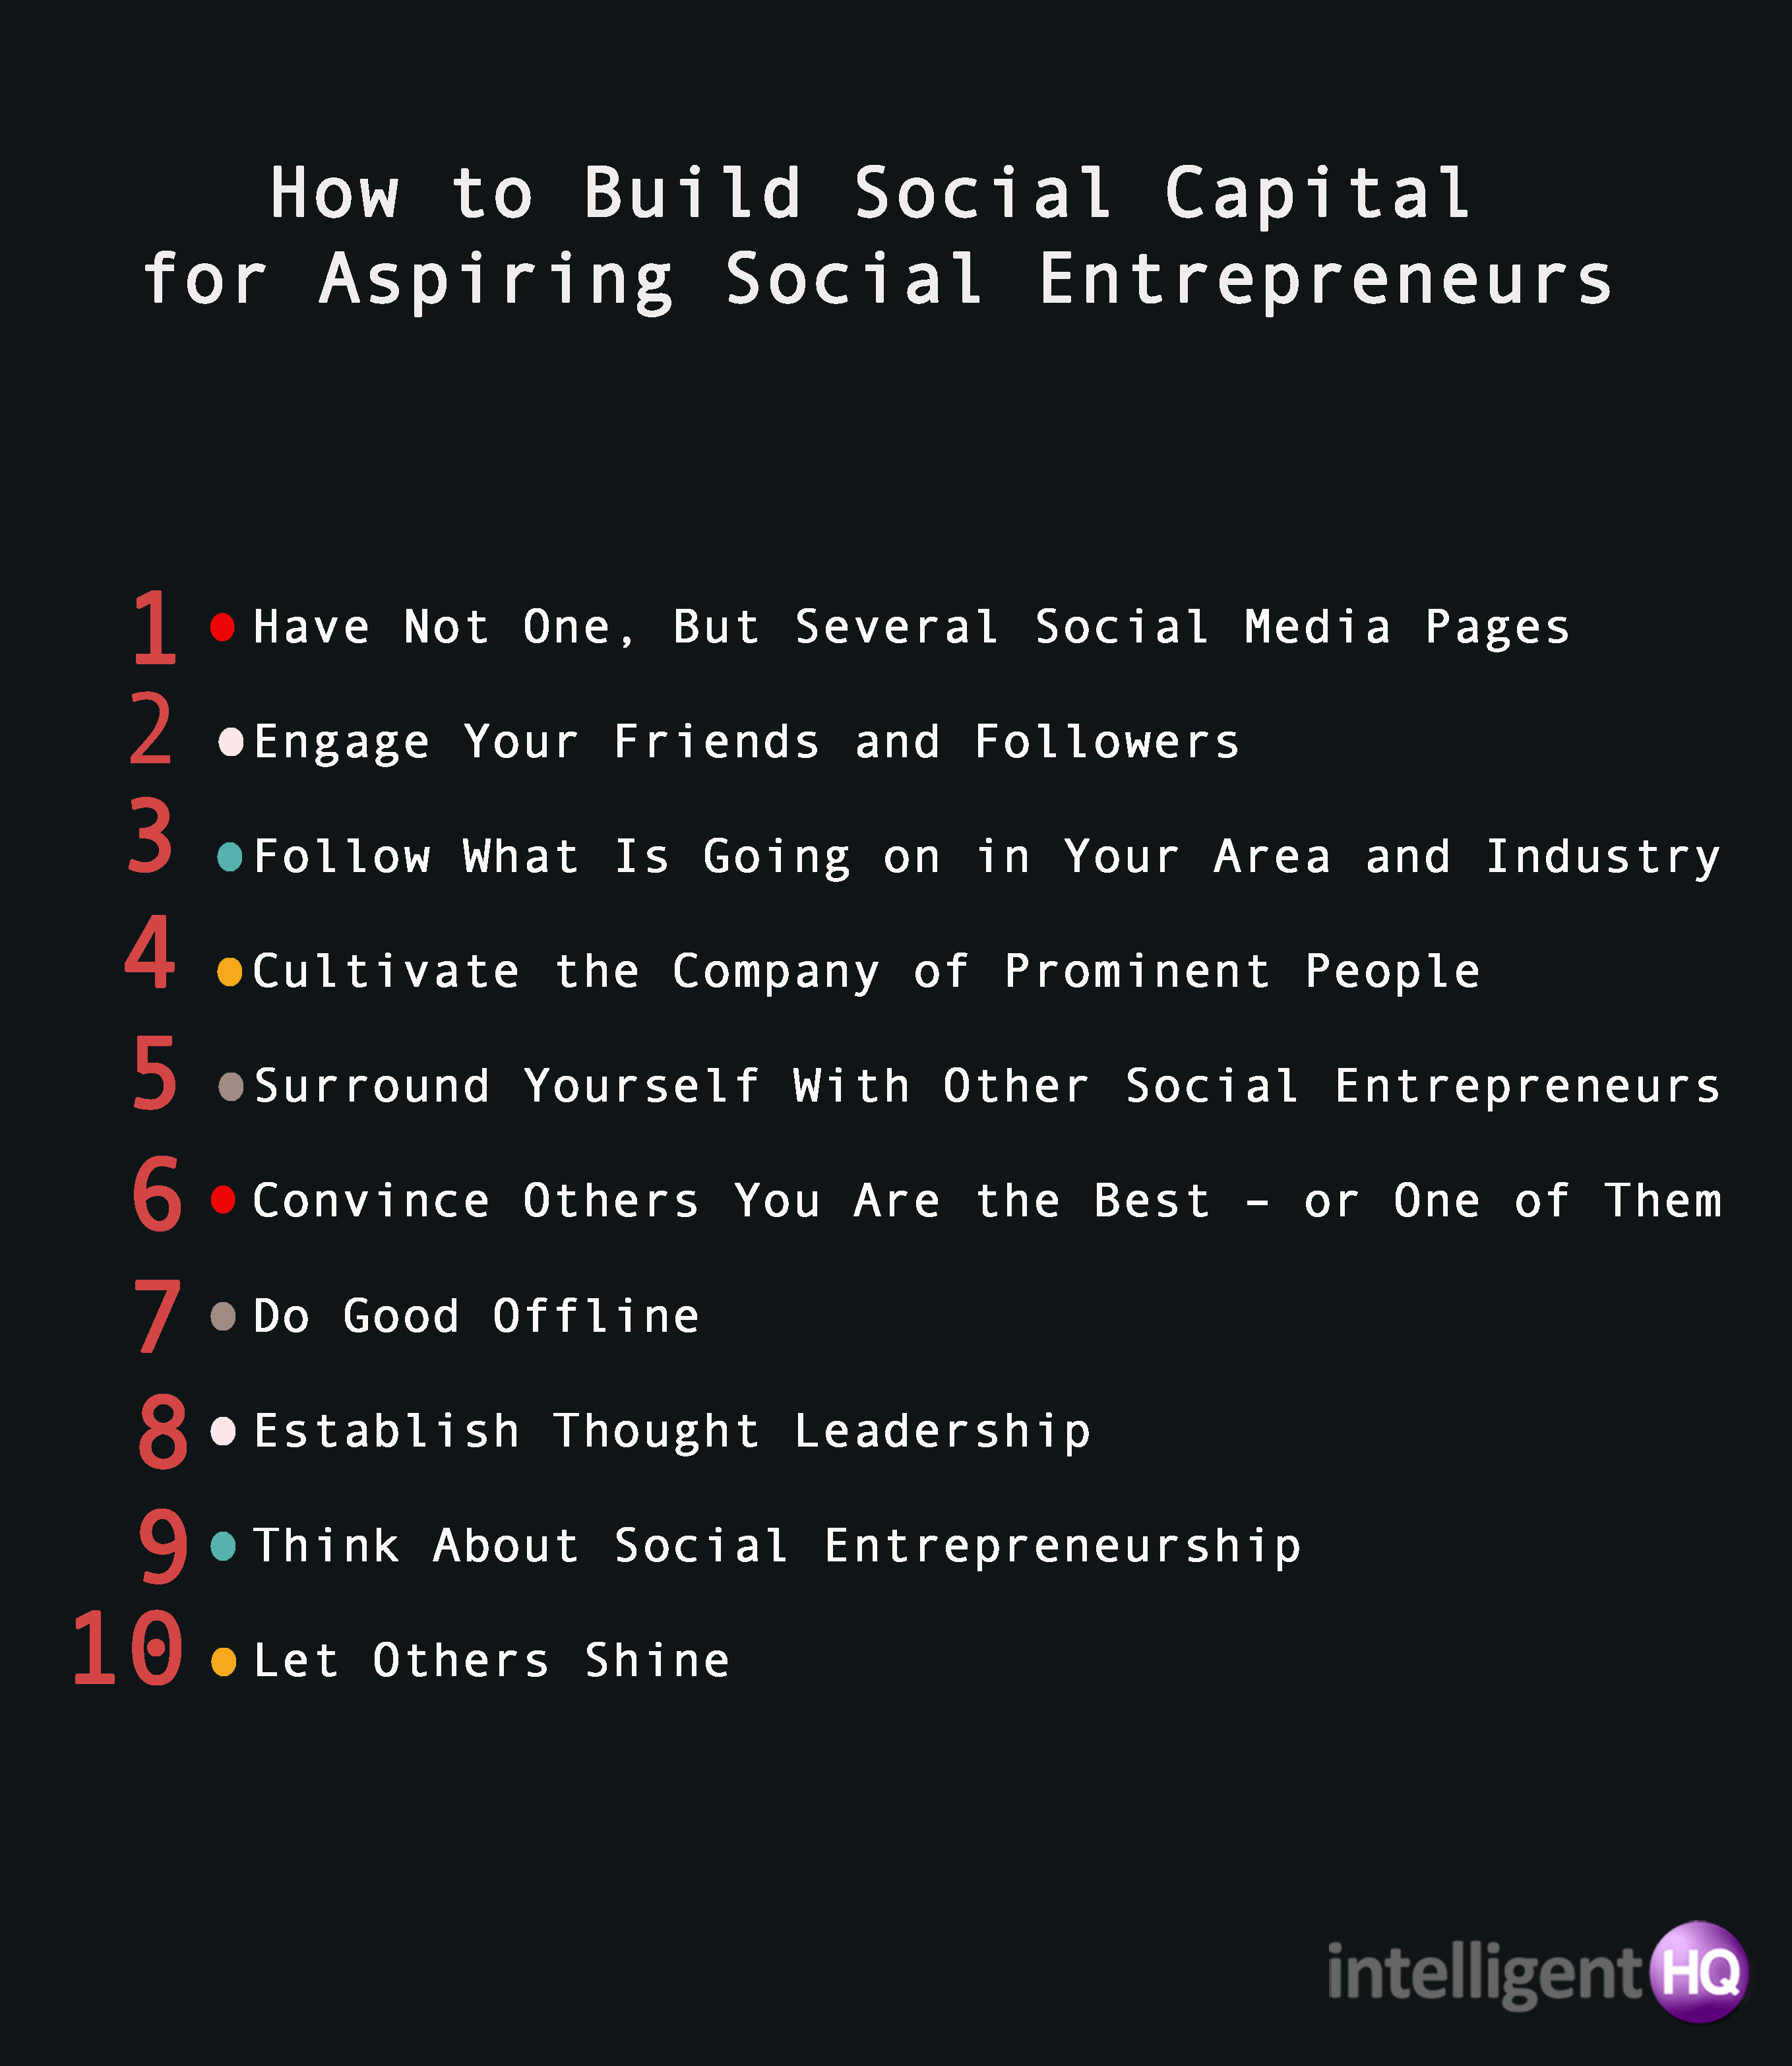 10 ways to build social capital Intelligenthq